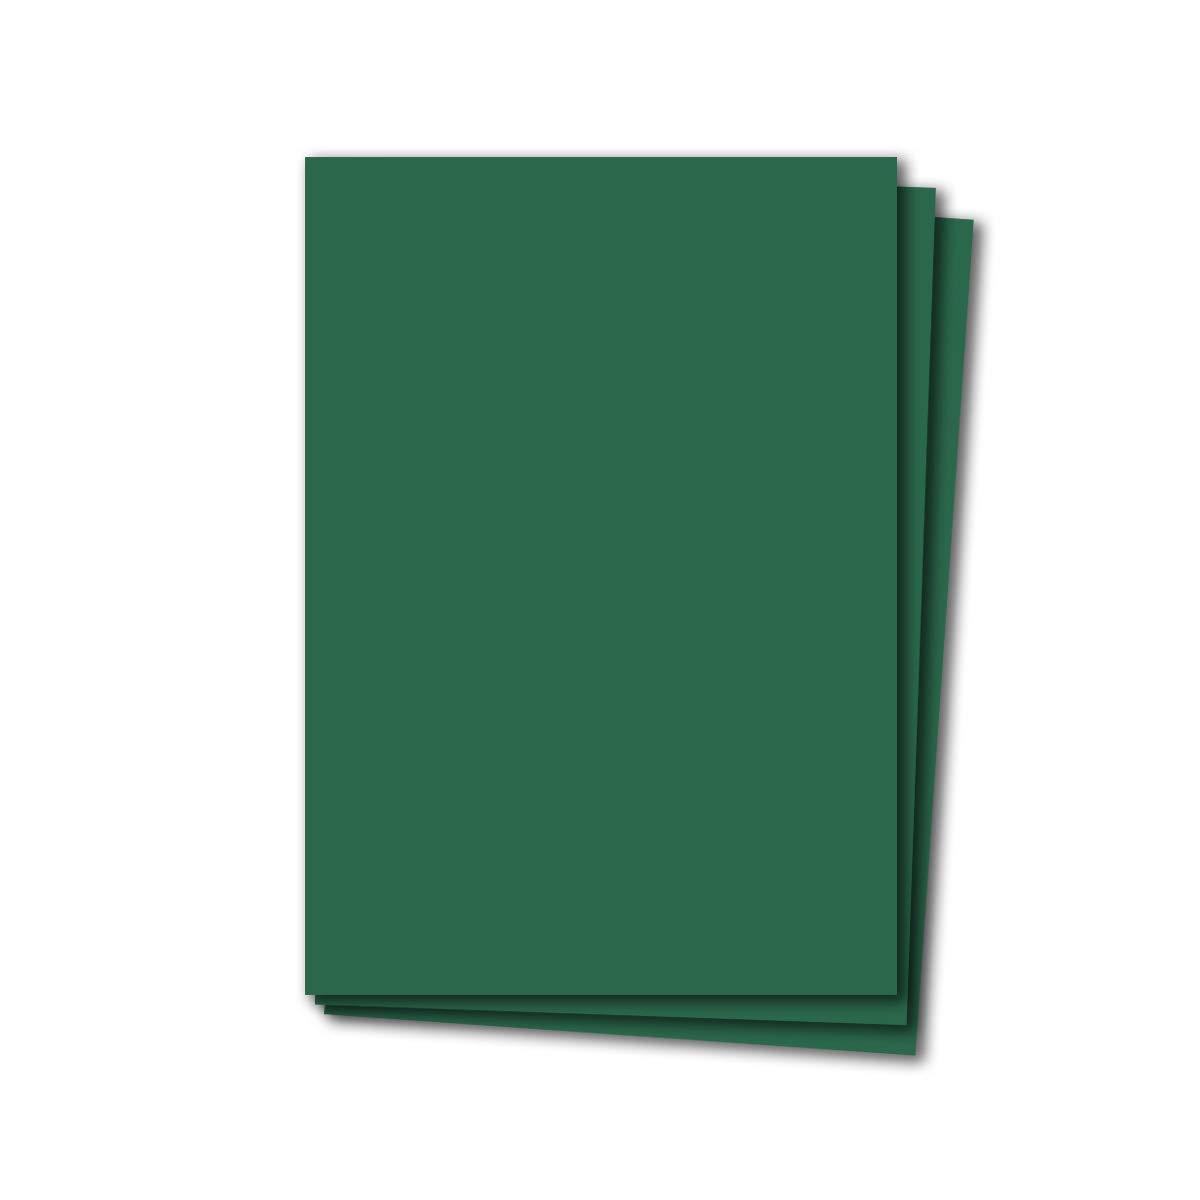 200 Blatt Ton-Karton DIN A4 - Farbe  Lila -Ton-Papier -Ton-Papier -Ton-Papier 240 g m² gerippte Oberfläche - Ton-Zeichen-Papier Bastel-Papier Bastel-Karton - Glüxx-Agent B07K1GZVMZ | Gemäßigten Kosten  4df1c4